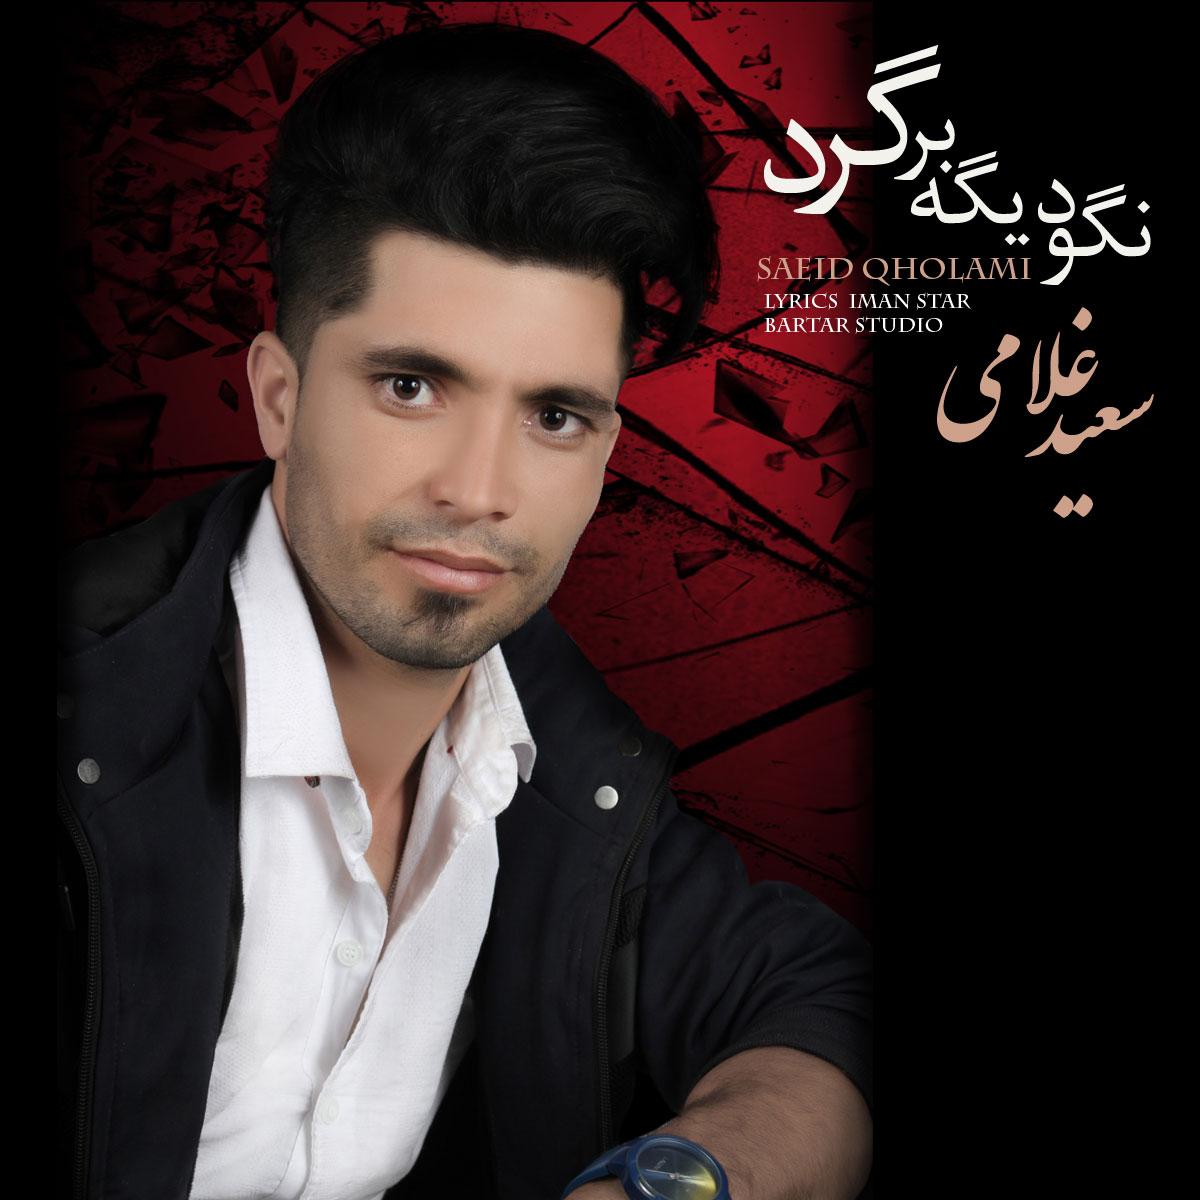 Saeid Qholami – Nago Dige Bargard